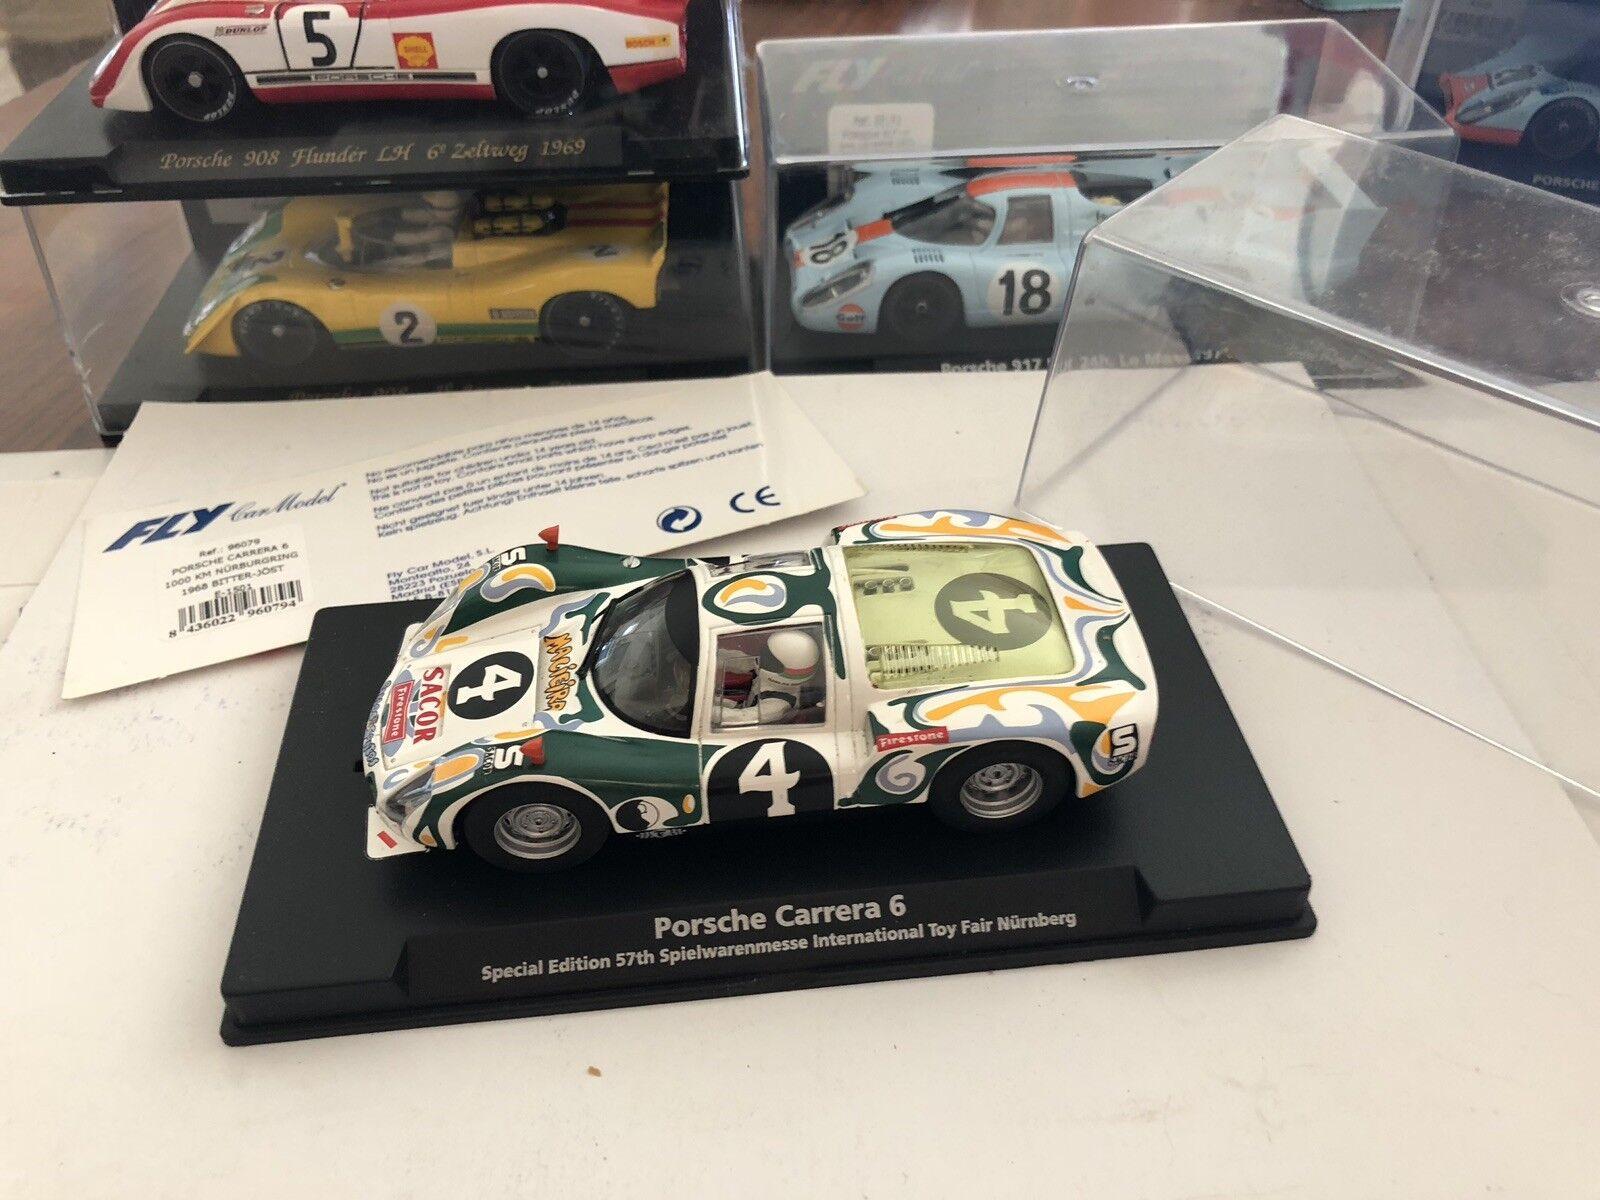 Fly Car Model Porsche Carrera 6 Le Mans Slotcar Slot 1 32 No Ninco Scalextric